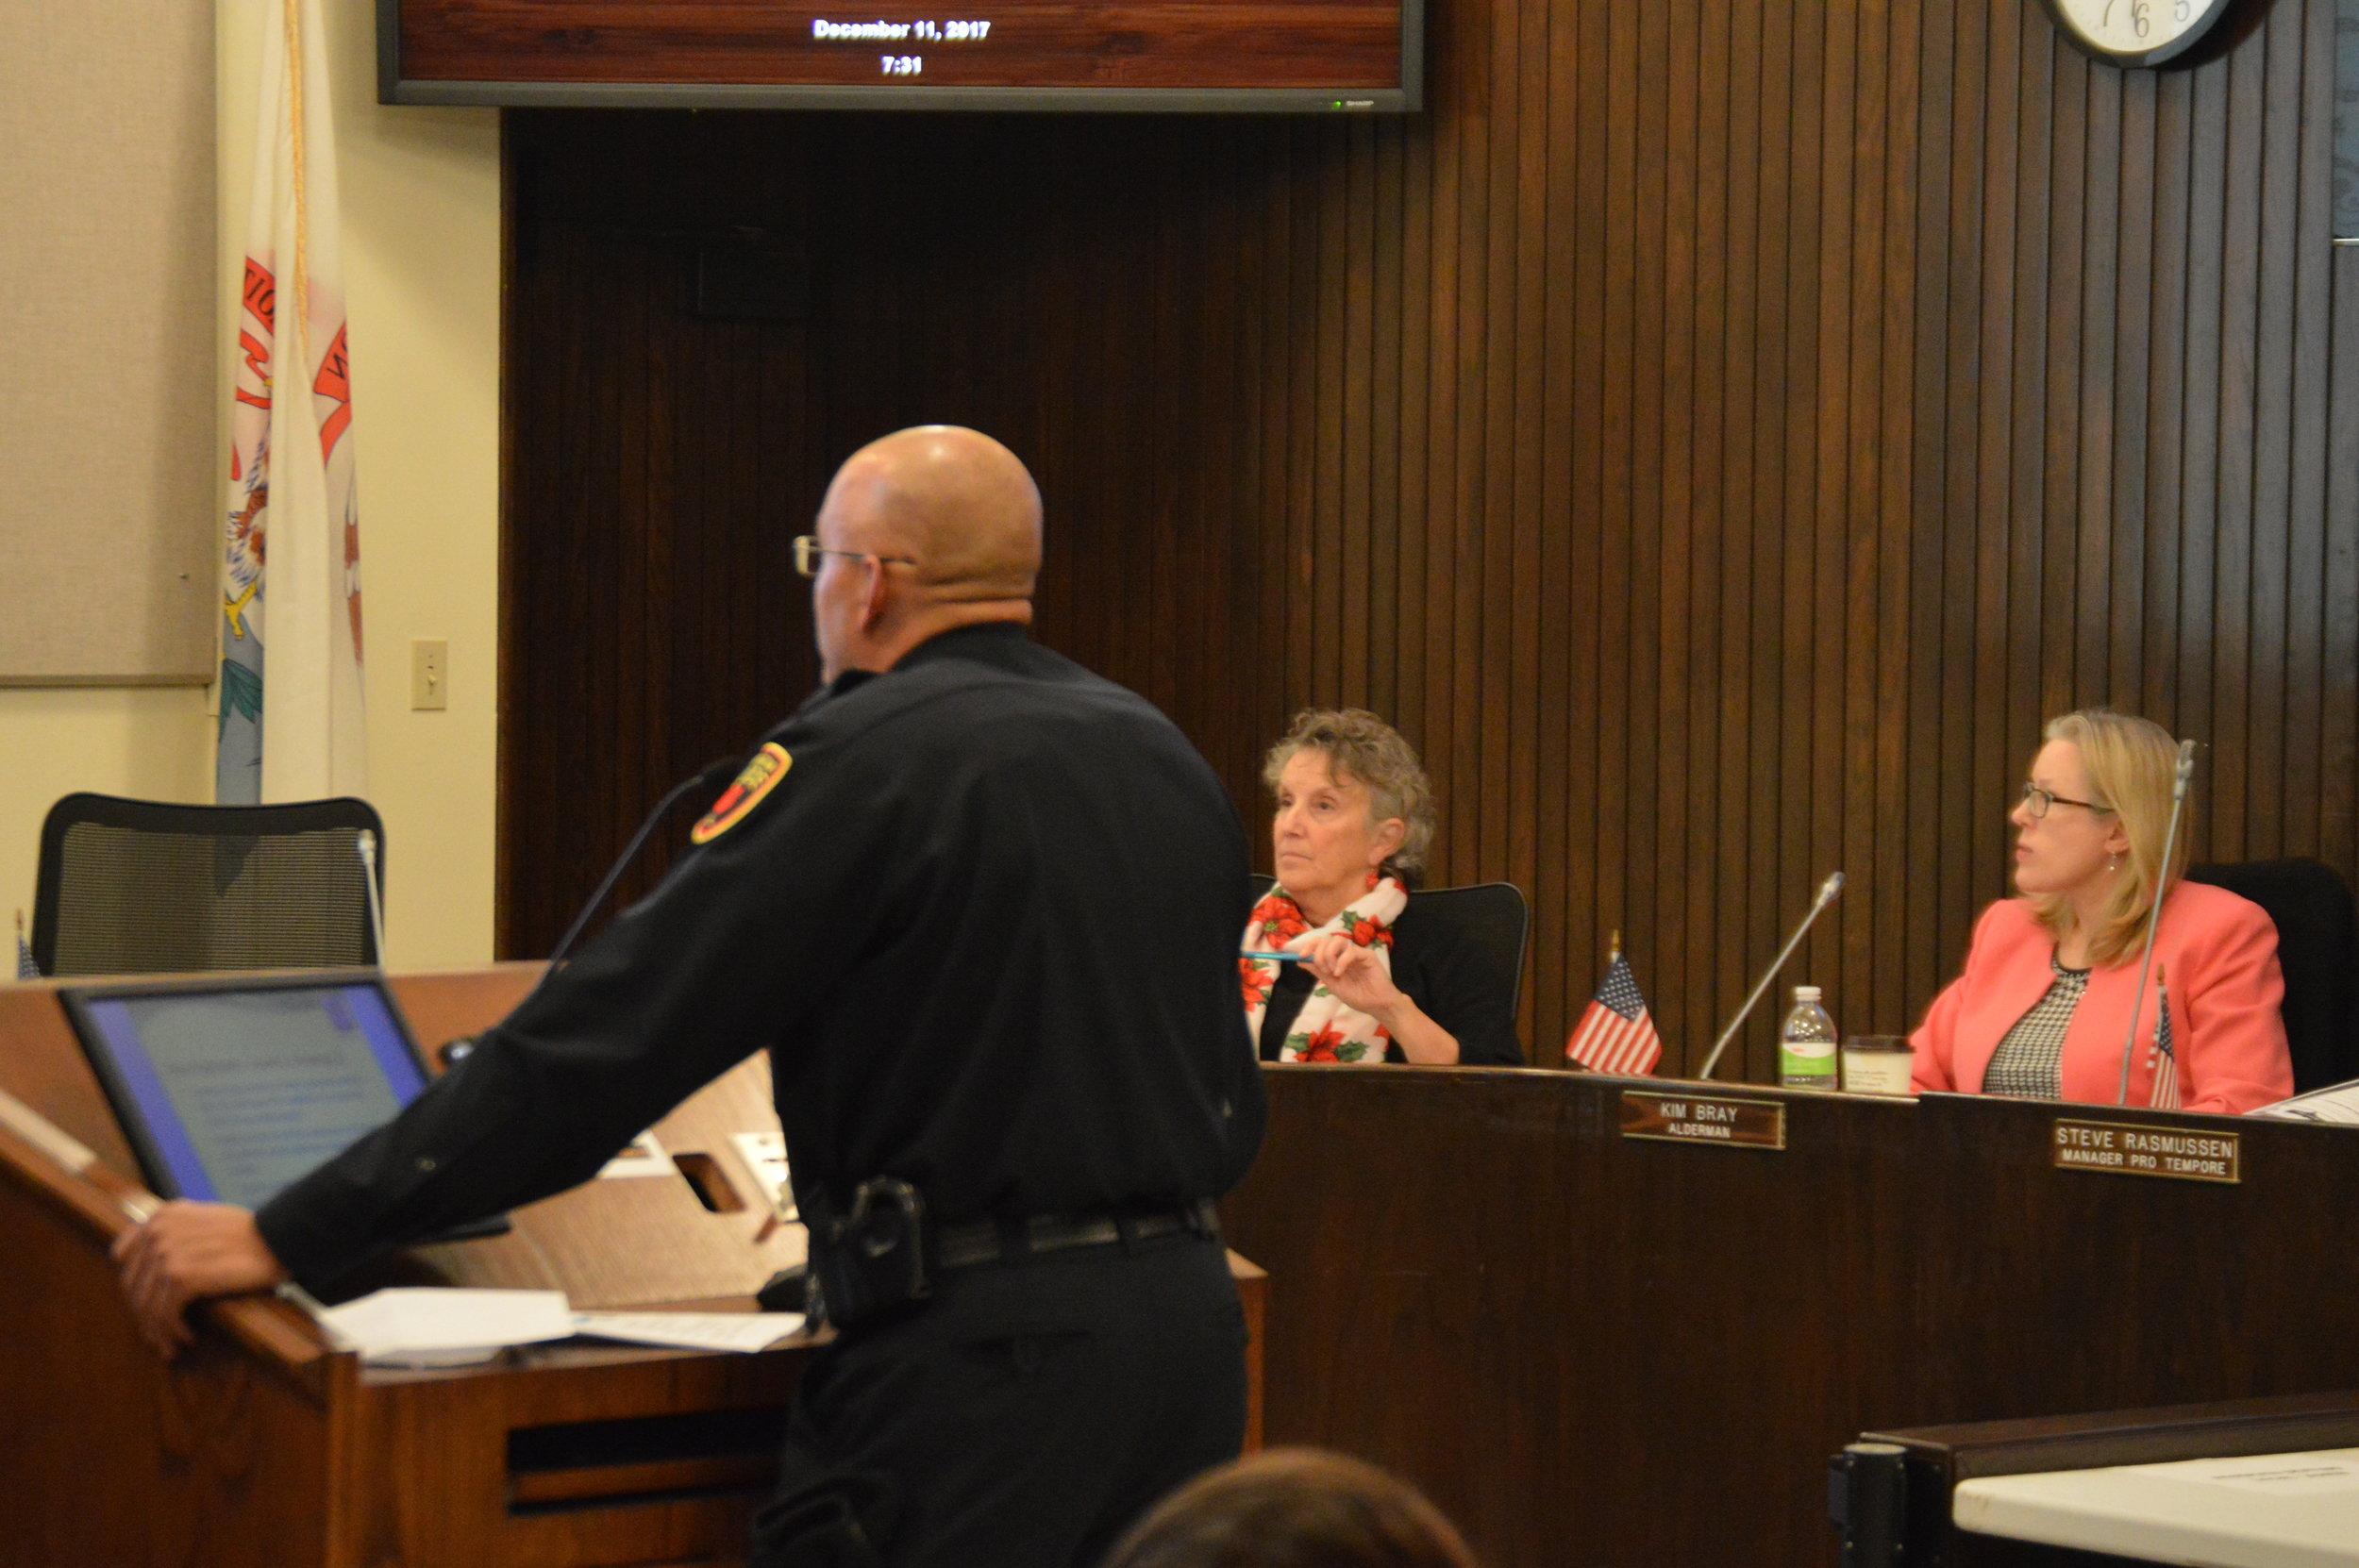 Council Briefing - December 11, 2017